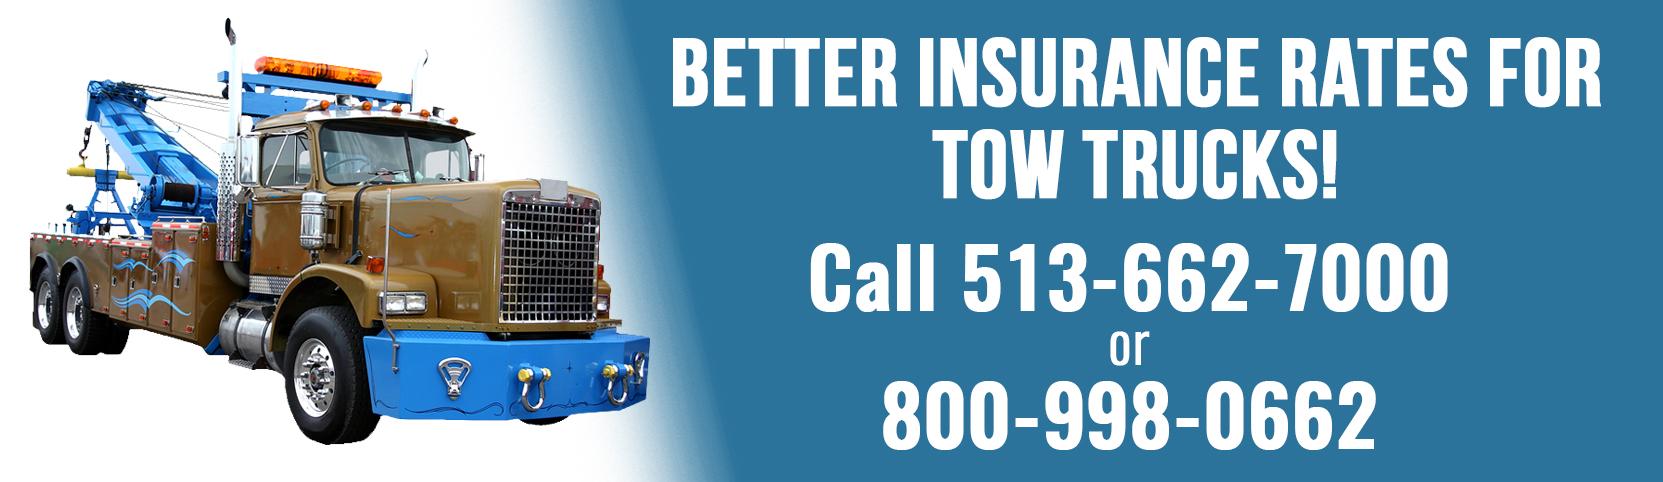 Tow Truck Insurance Columbus